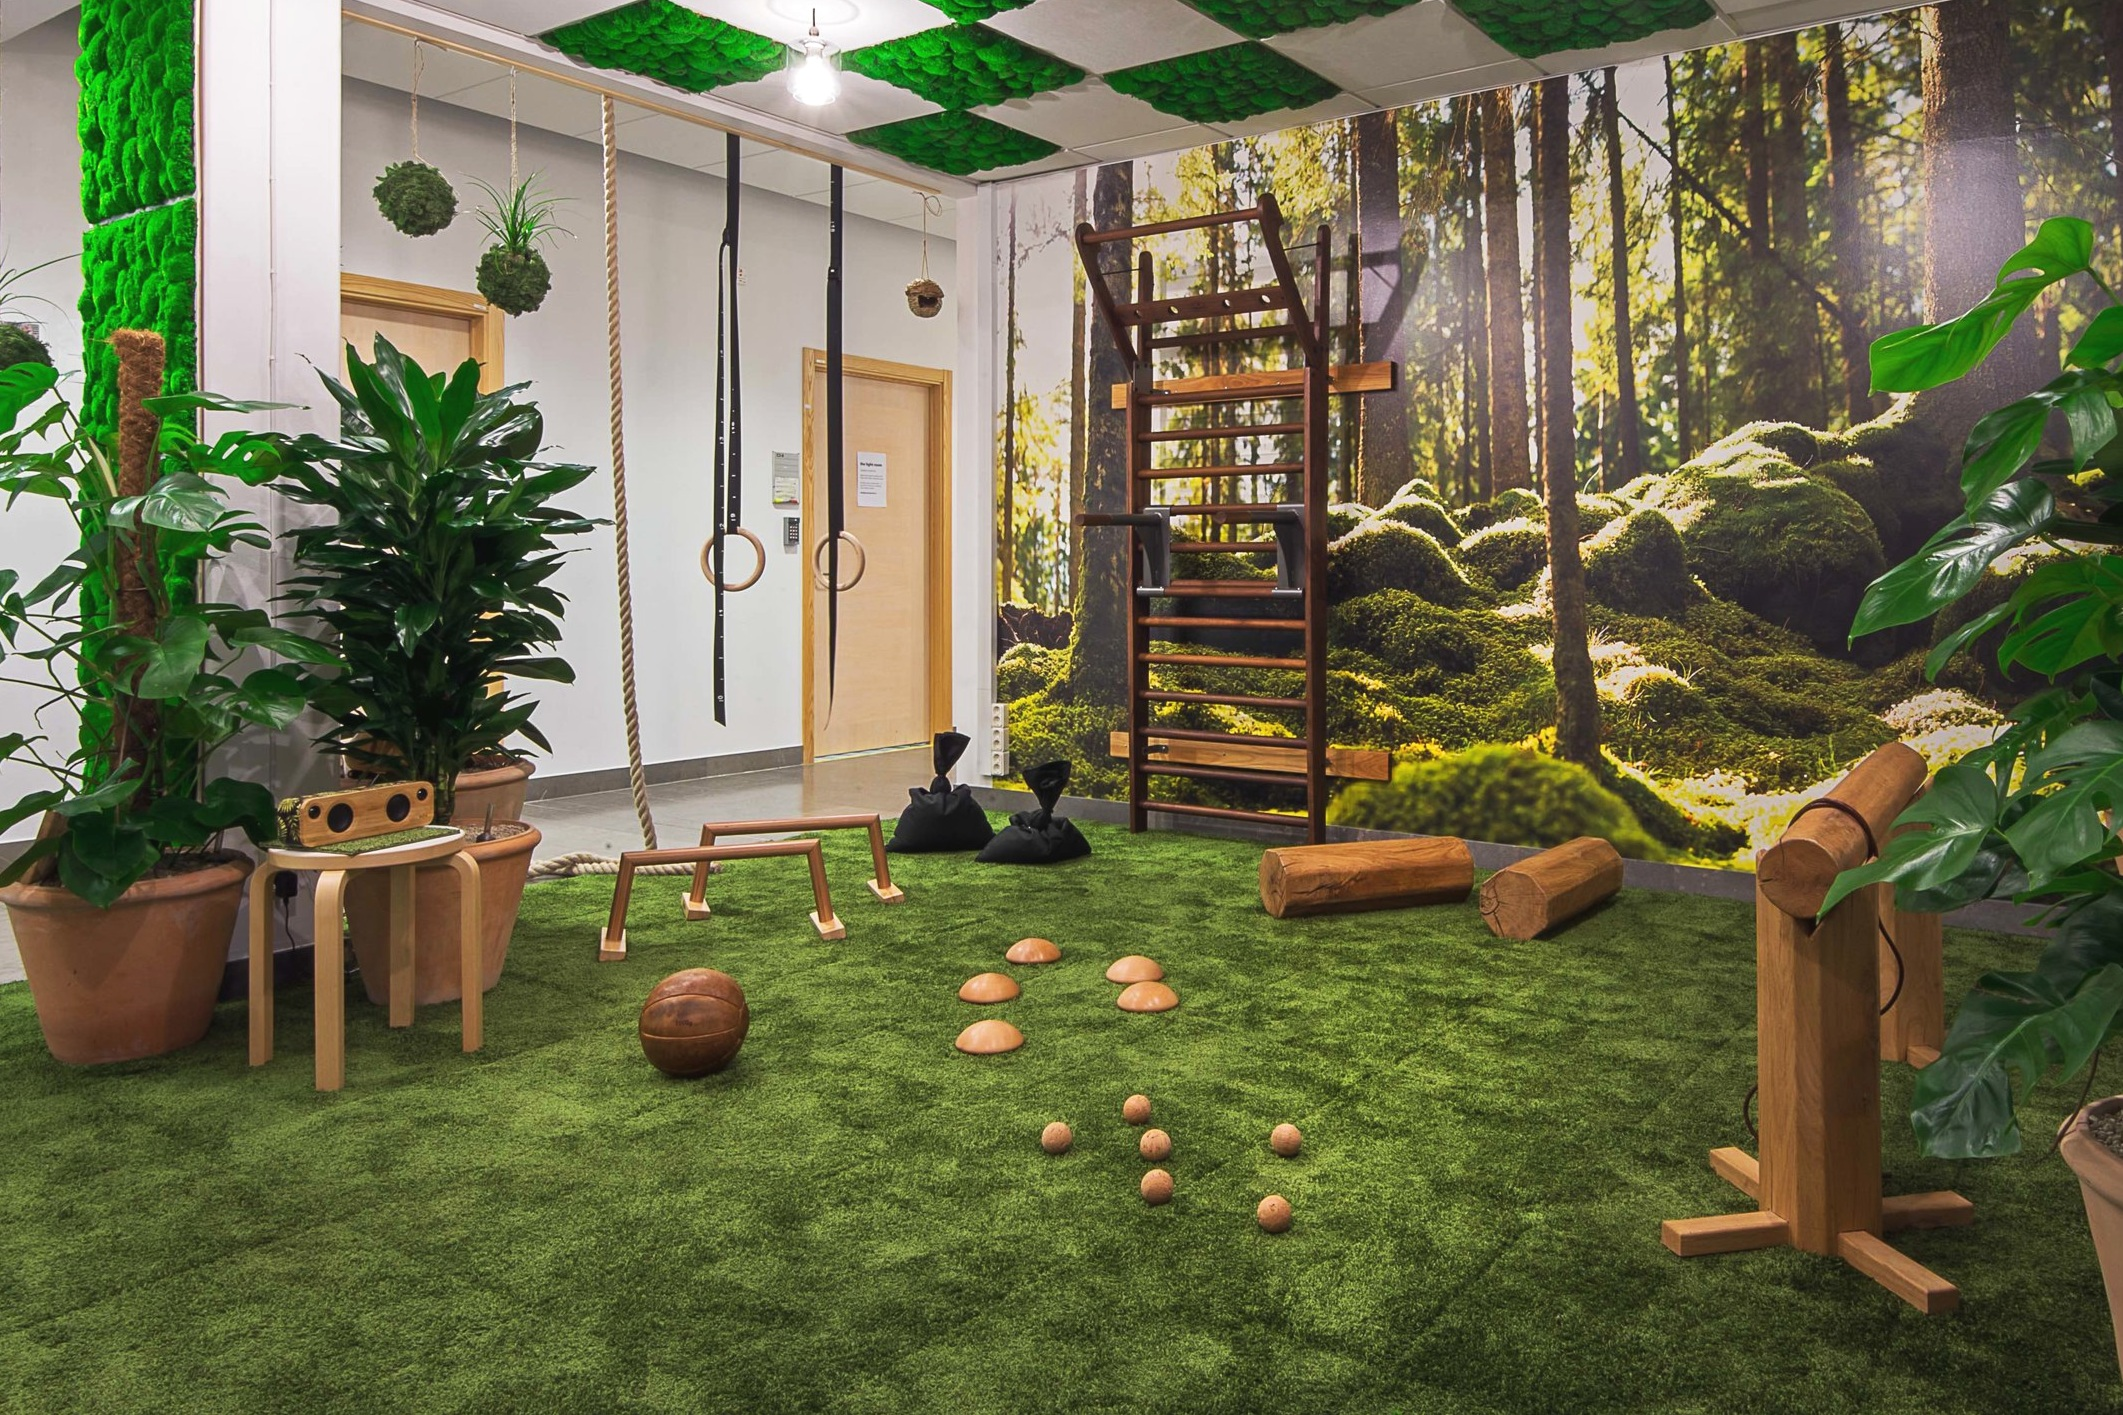 biofit karolinska institutet gym green nature office